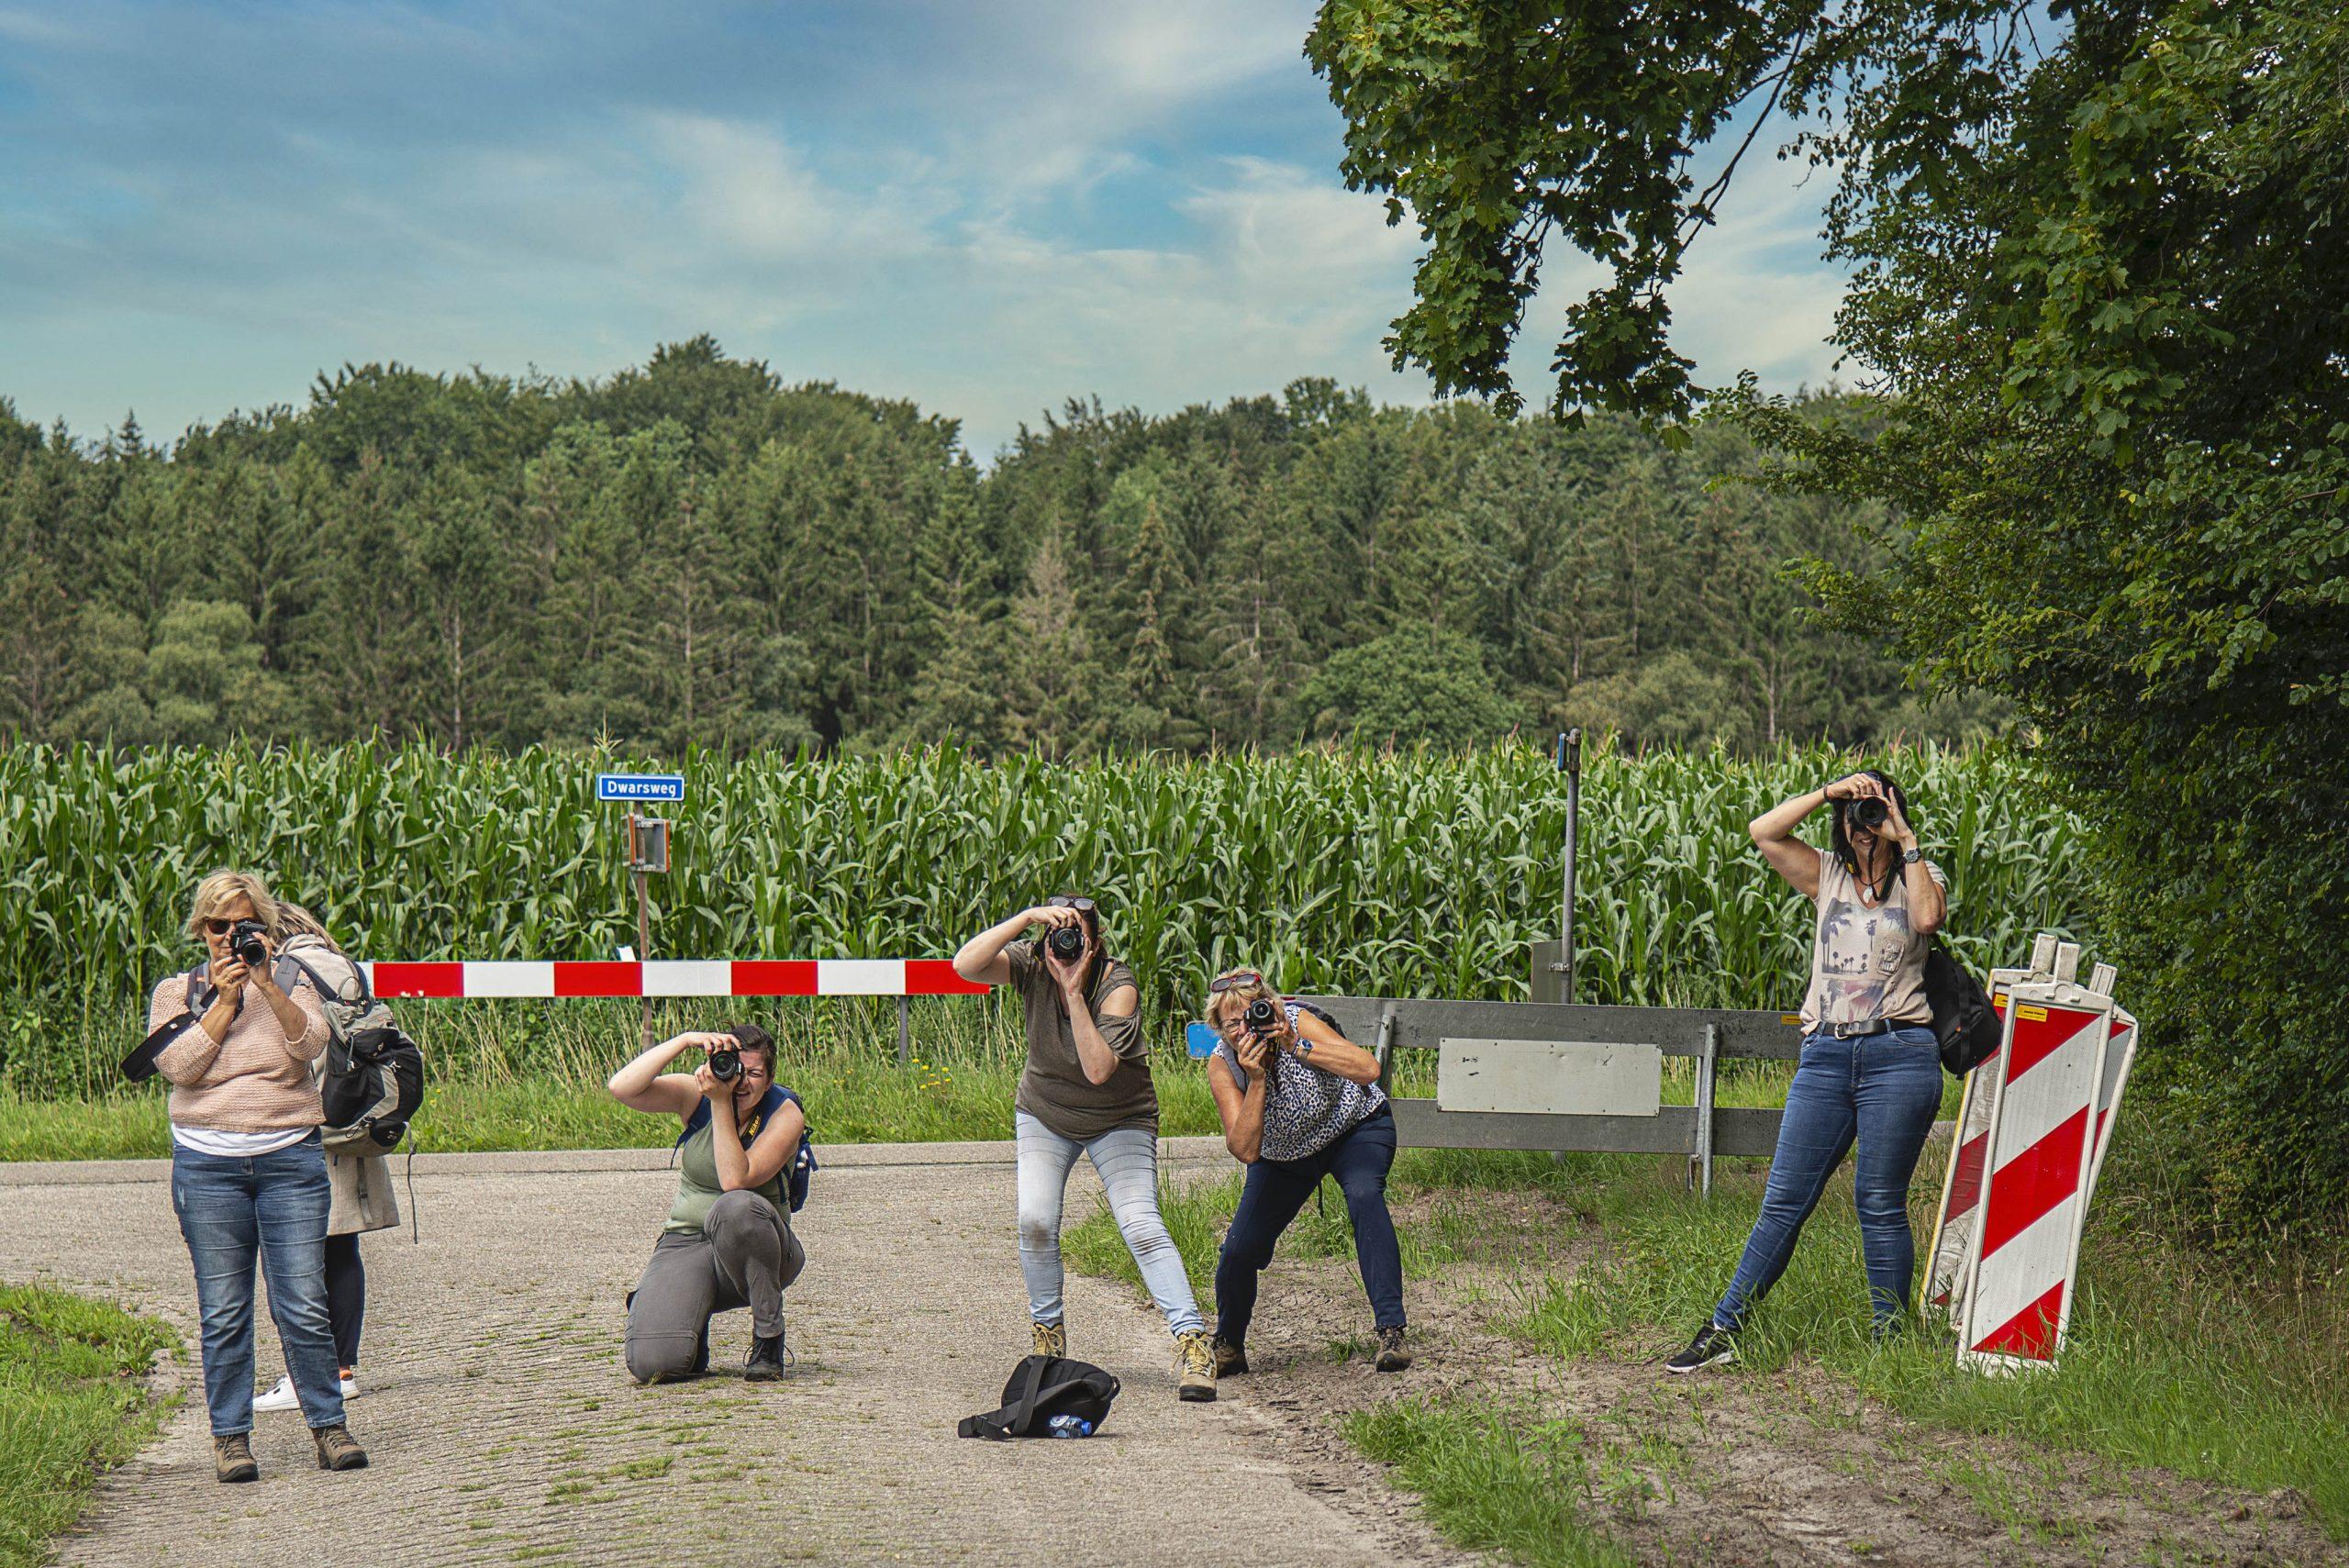 Photowalk Mindfulness fotografen